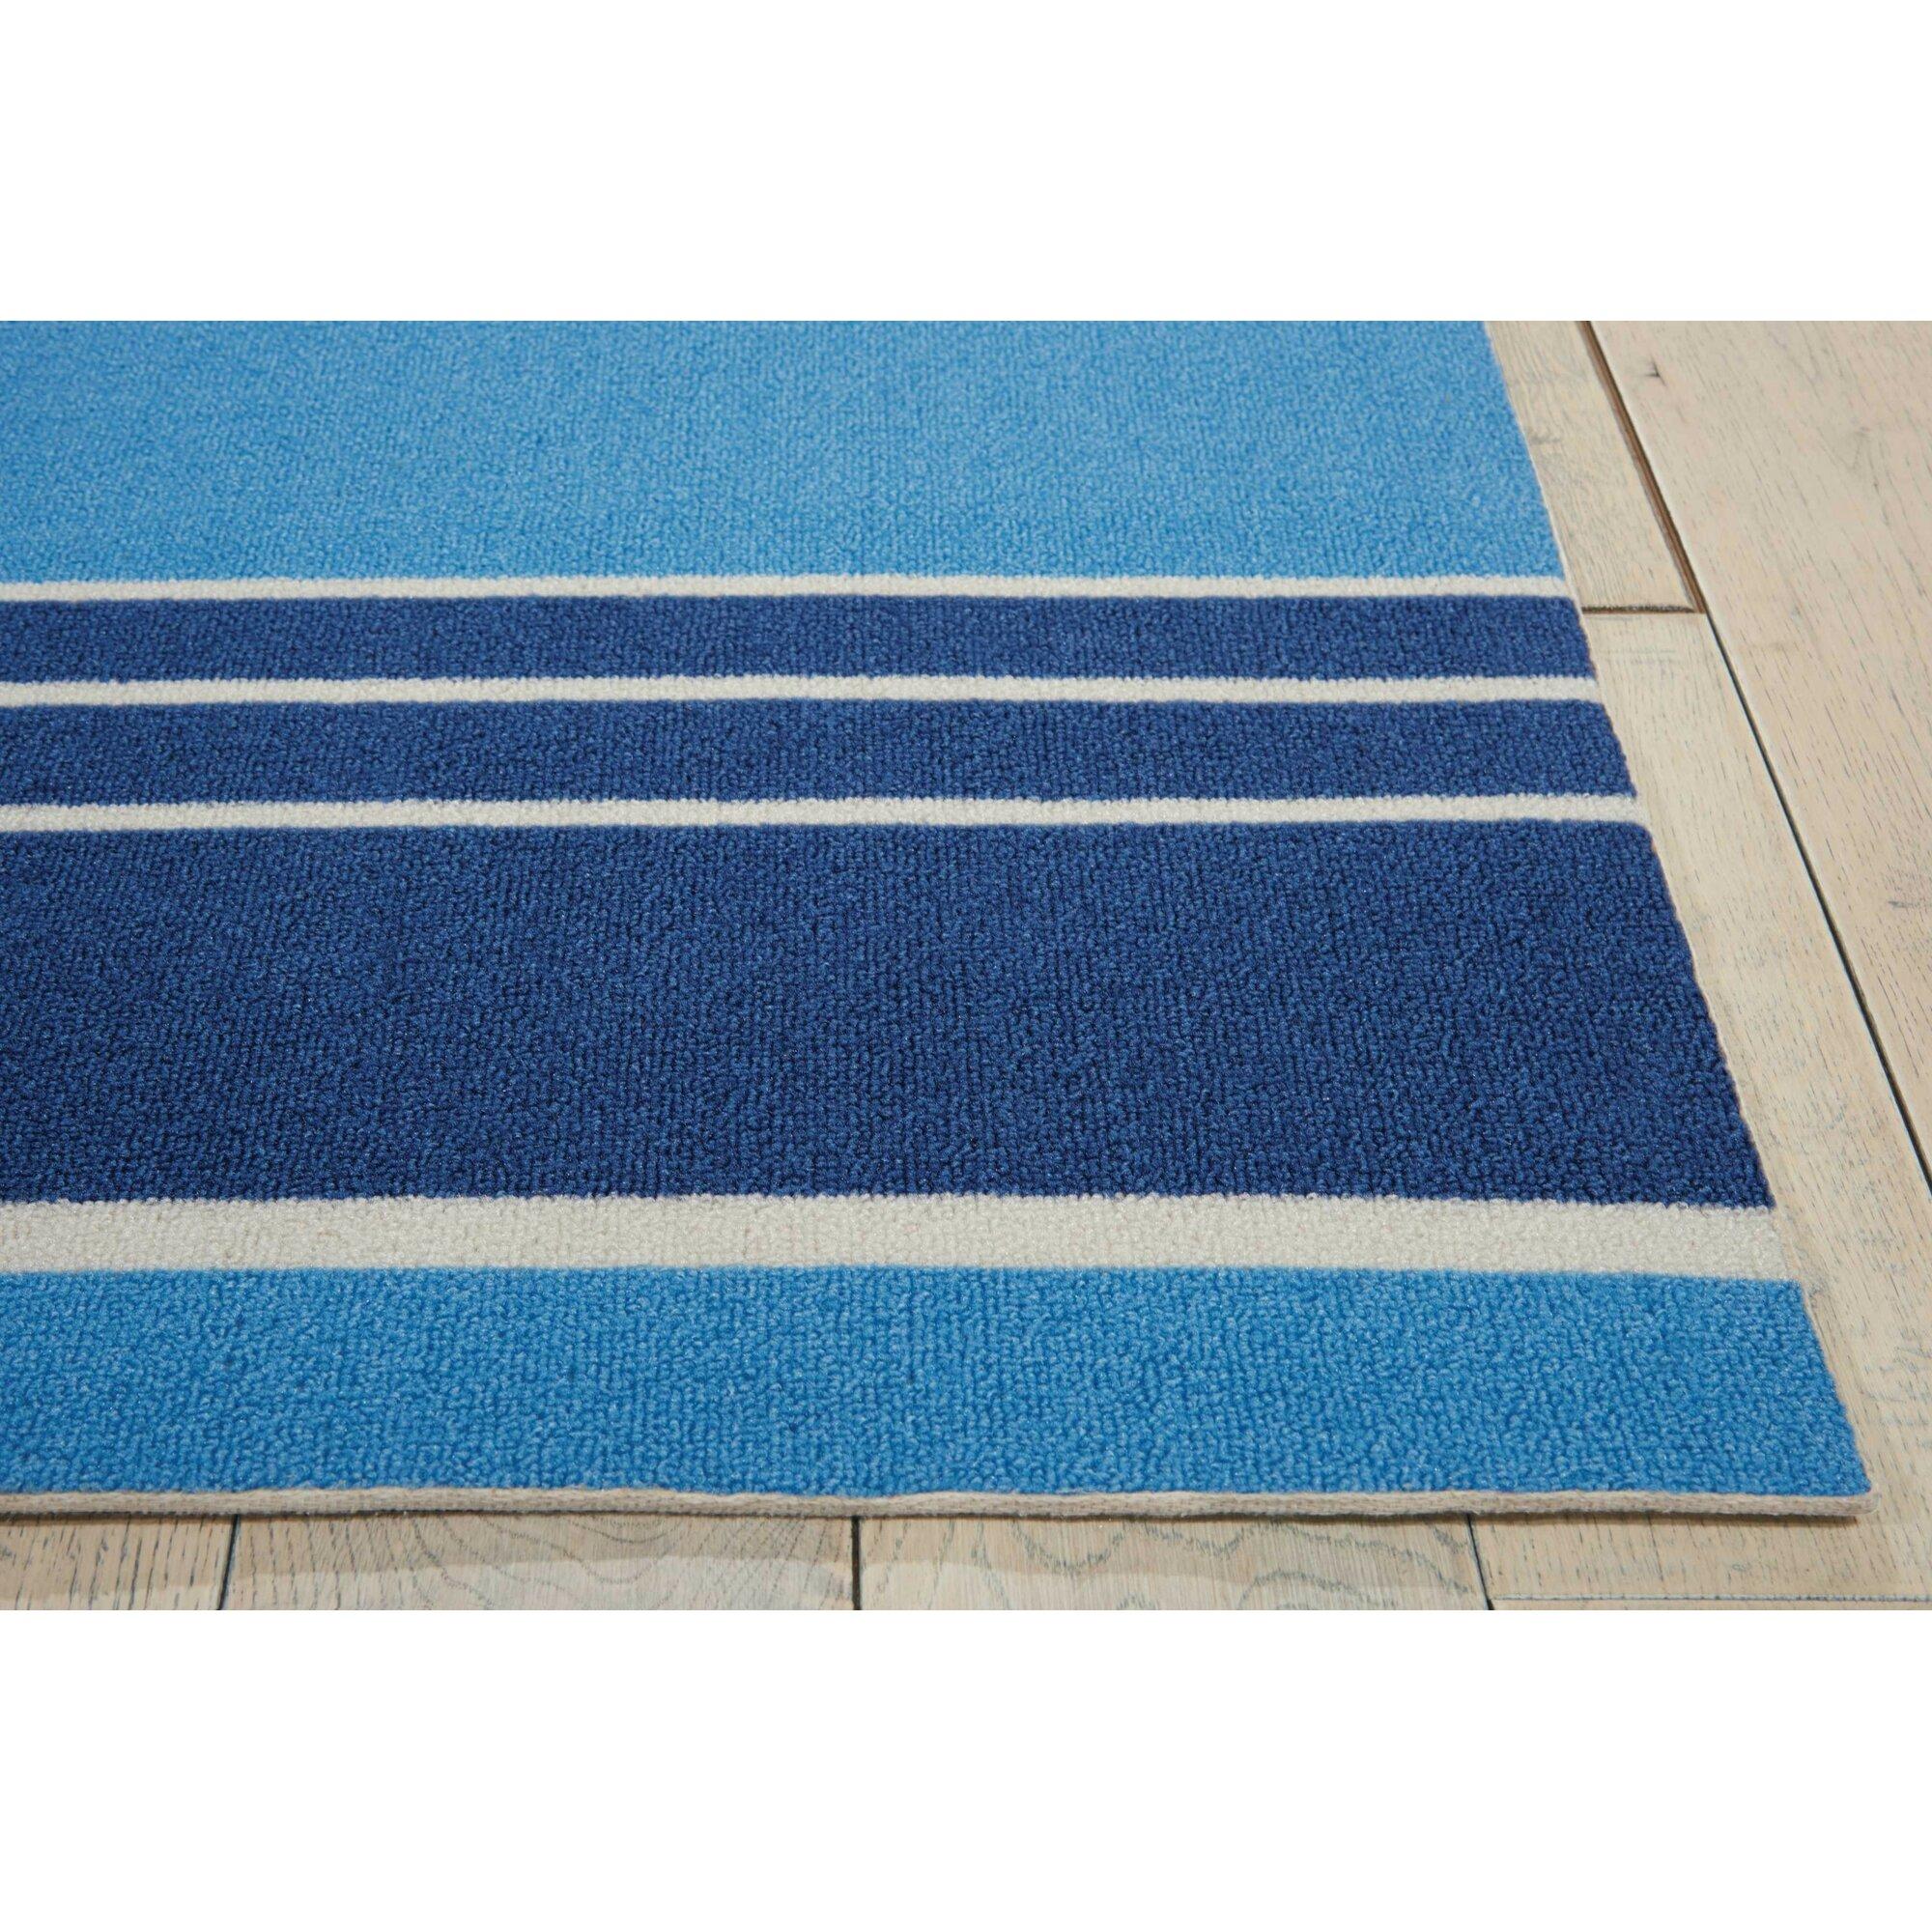 Waverly Sun n' Shade Blue IndoorOutdoor Area Rug & Reviews  Wayfair # Sun Shower Rug_220024